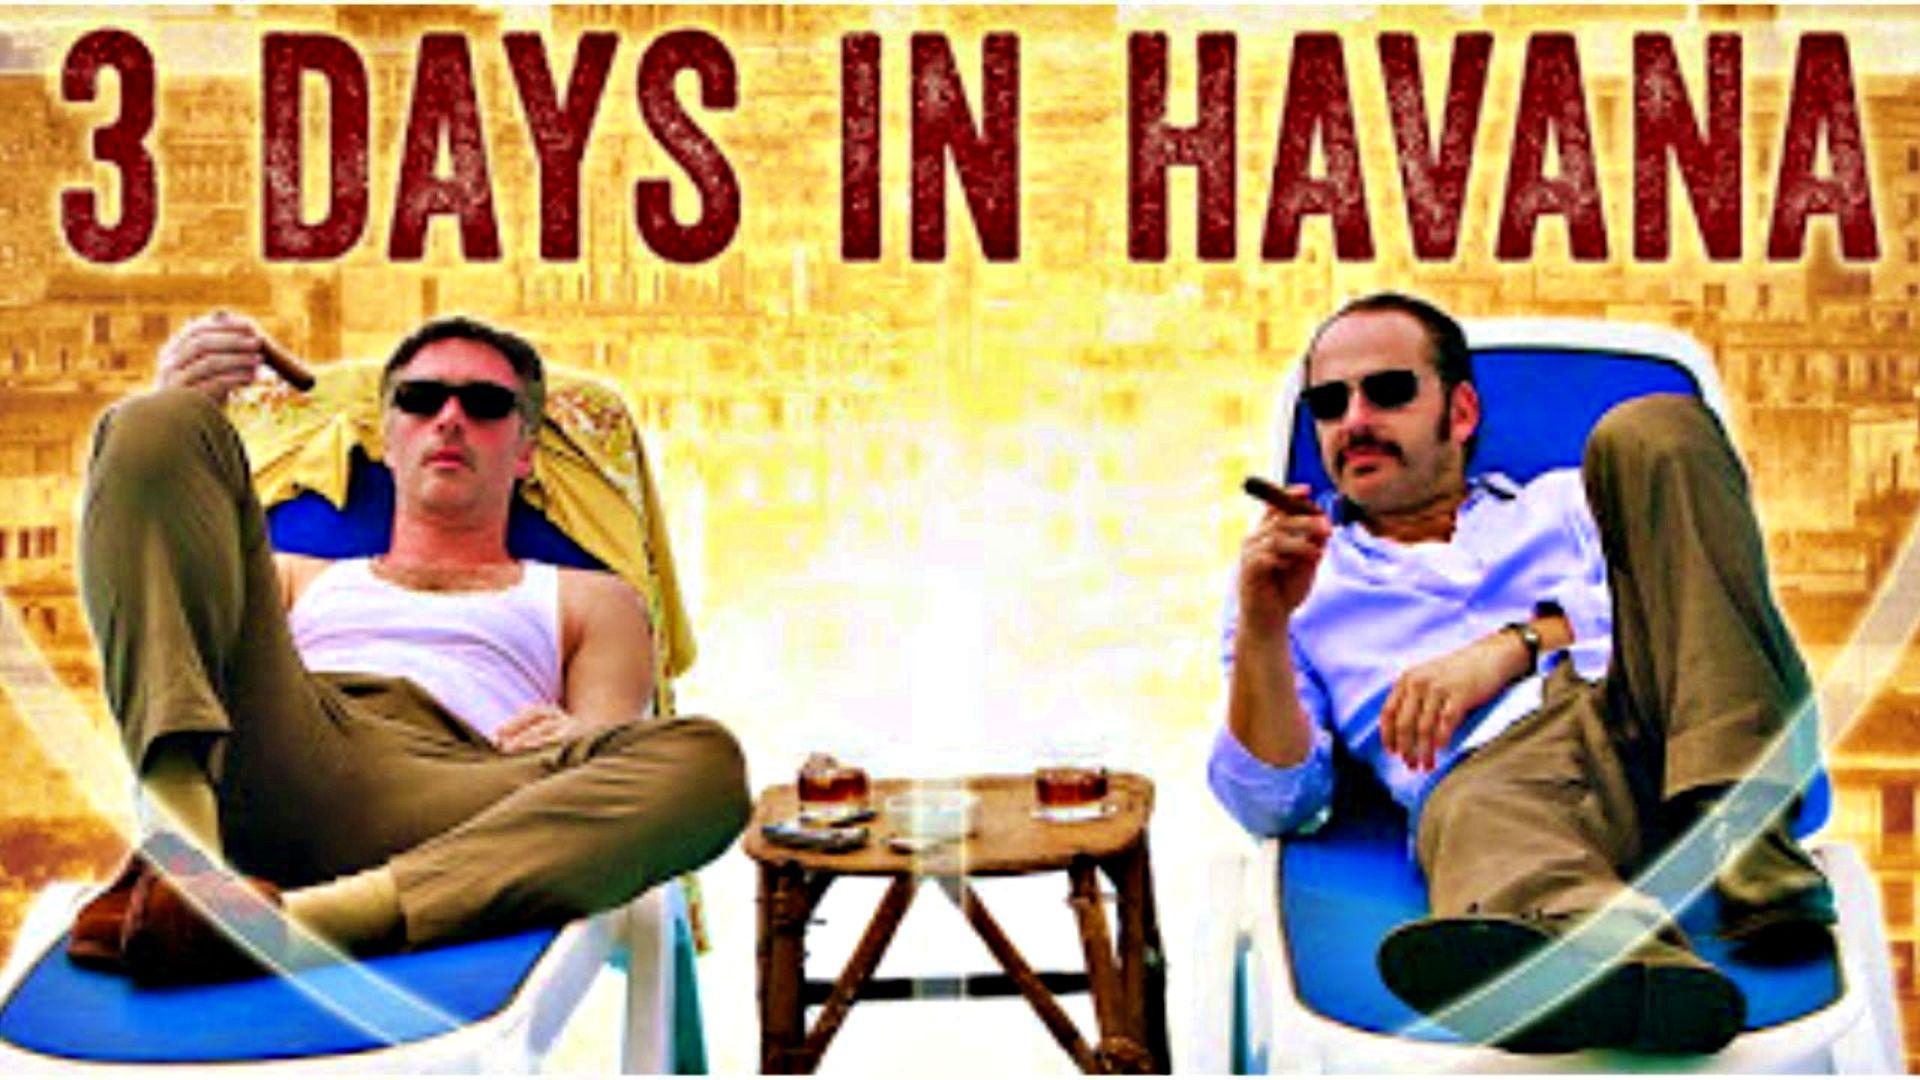 3 Days in Havana